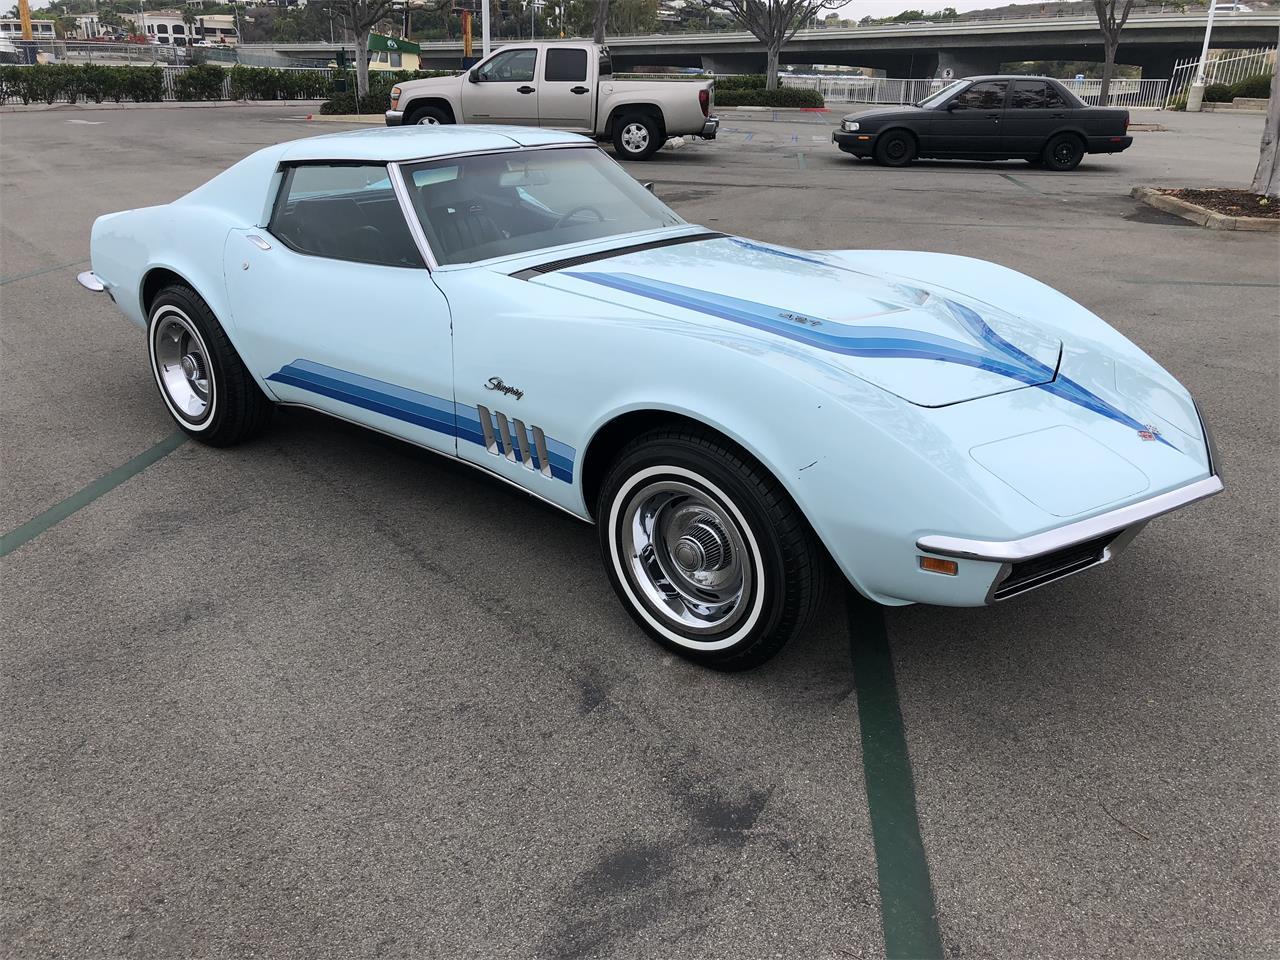 1969 Chevrolet Corvette (CC-1197849) for sale in Huntington Beach, California